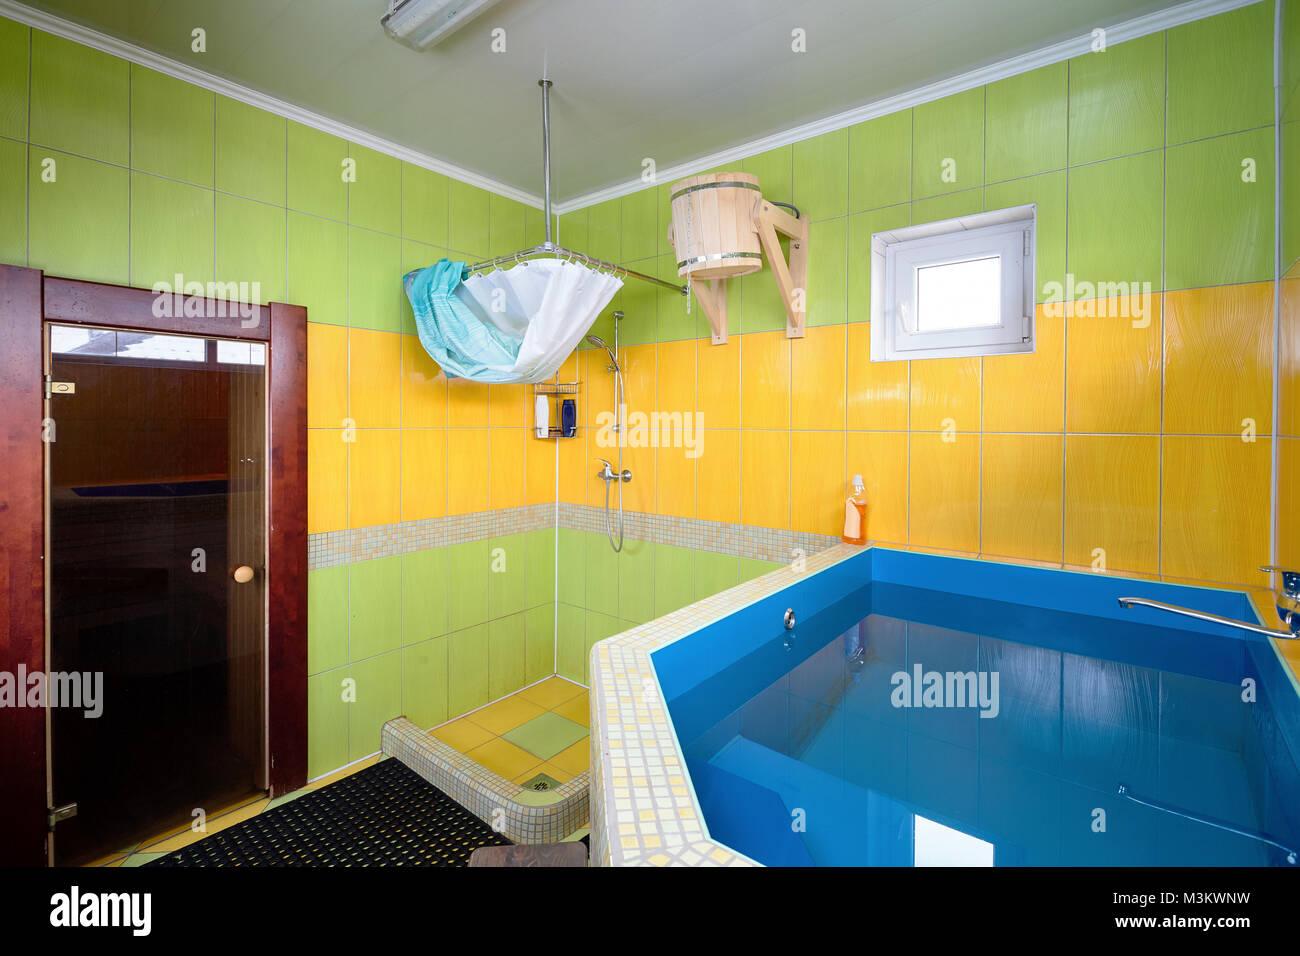 hygiene room stockfotos hygiene room bilder alamy. Black Bedroom Furniture Sets. Home Design Ideas